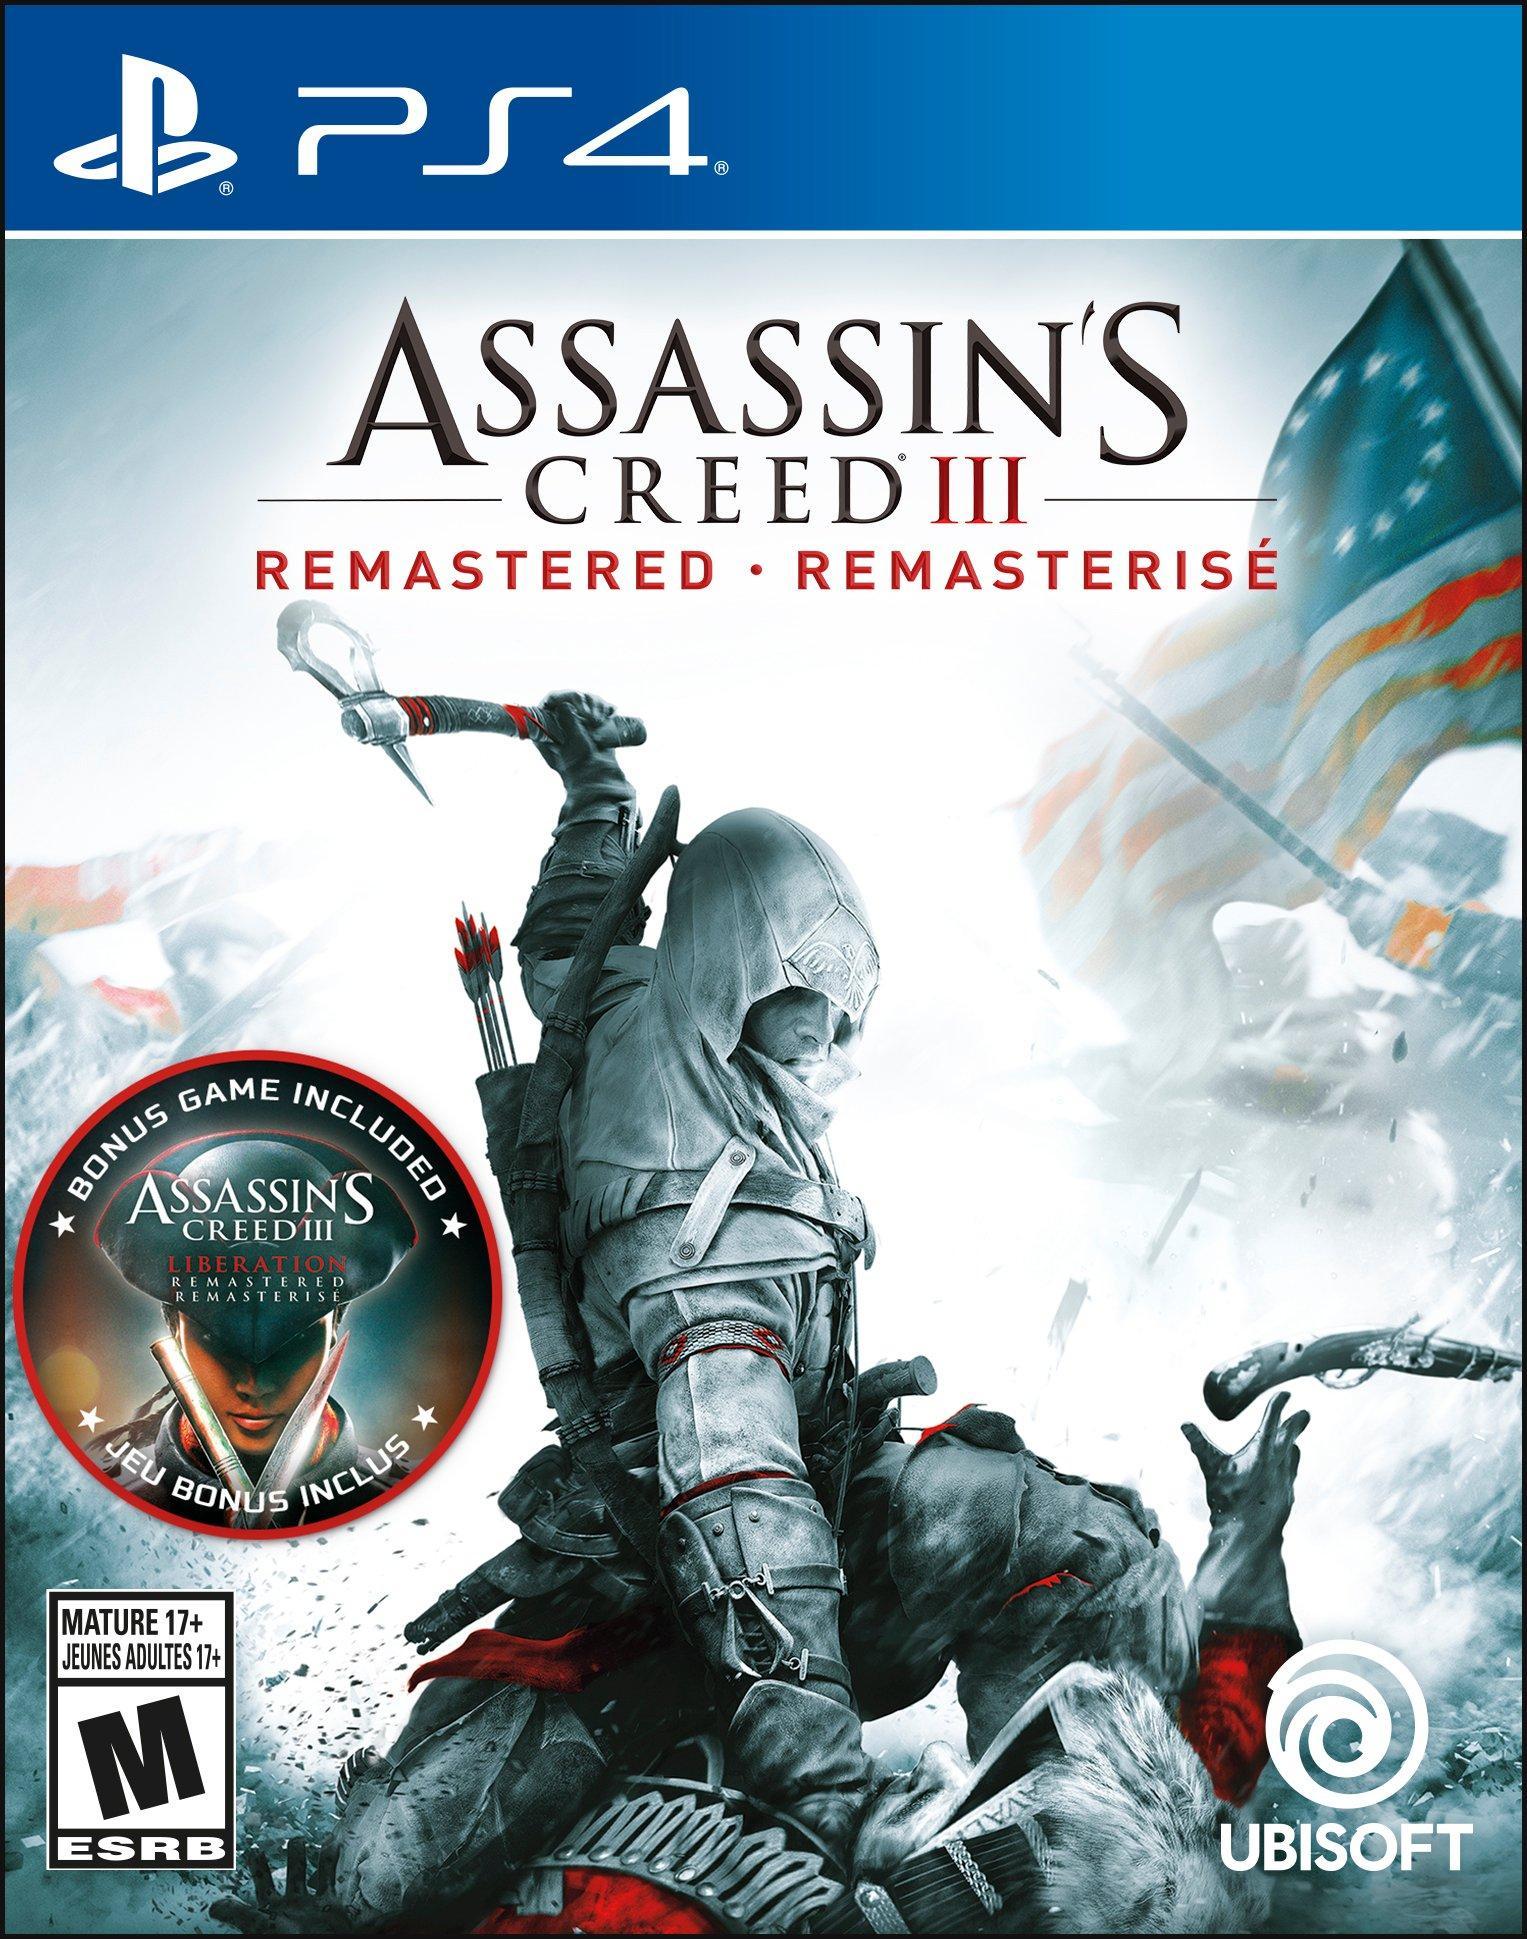 Assassin's Creed III Remastered | PlayStation 4 | GameStop $14.99